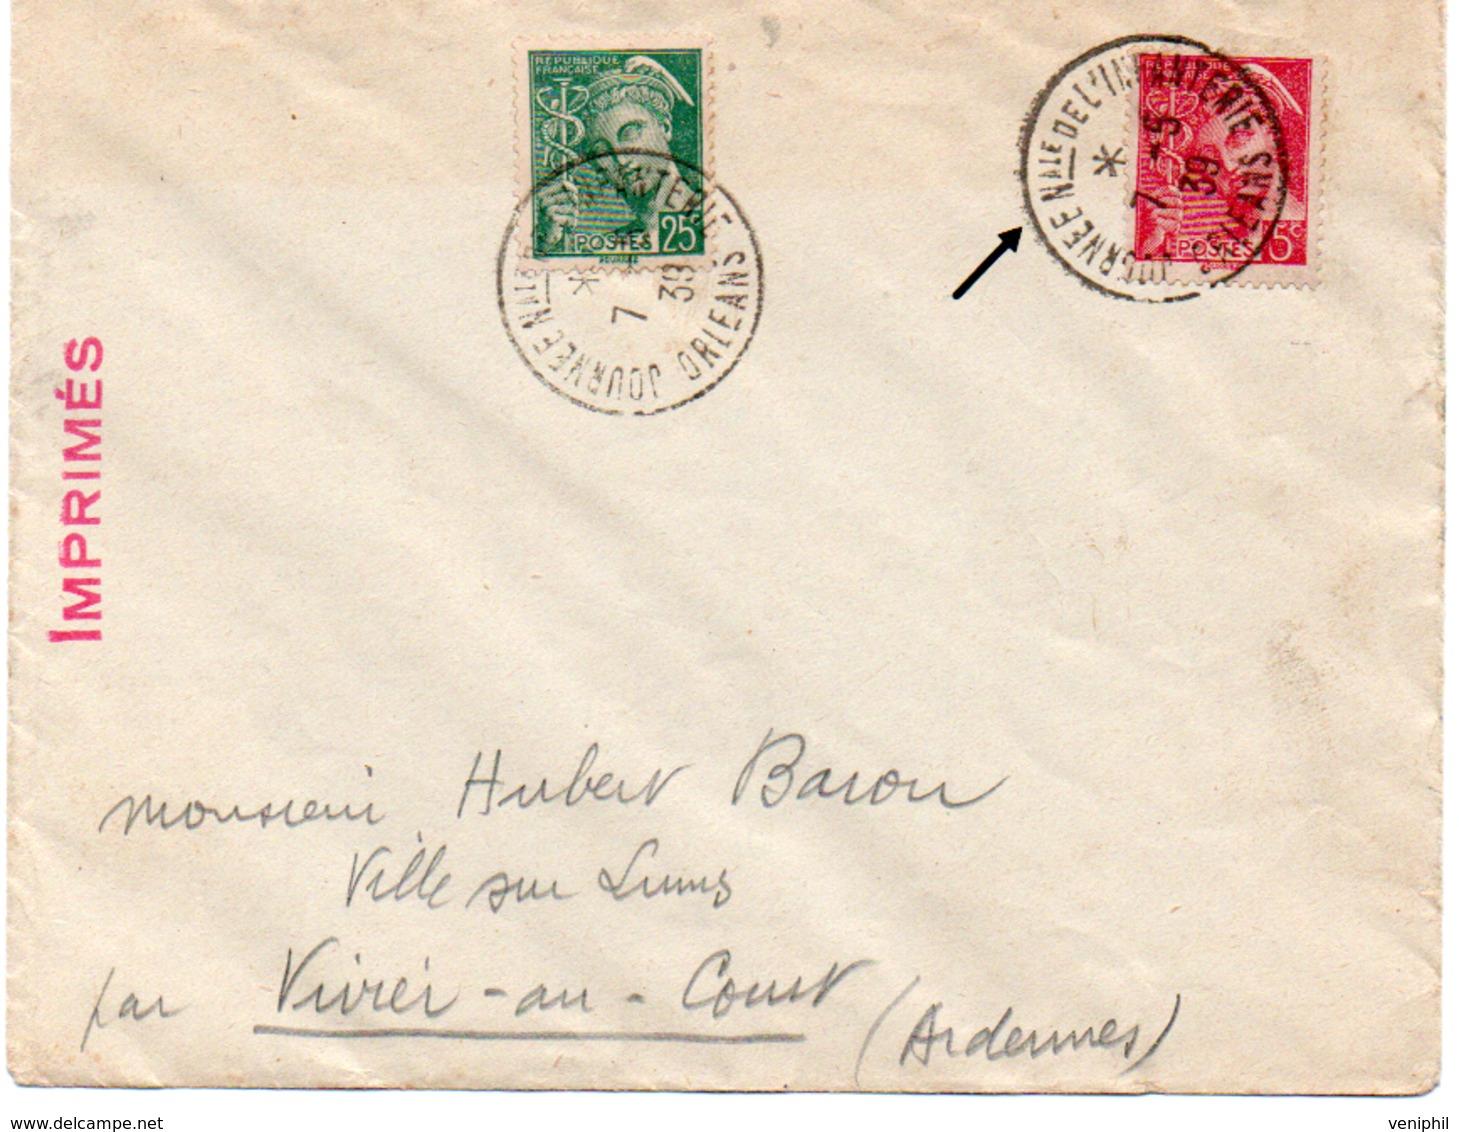 LETTRE AFFRANCHIE  TYPE MERCURE N° 406 + N° 411 -OBLIT CAD JOURNEE Nale DE L'INFANTERIE ORLEANS 1939 -1939 - Temporary Postmarks